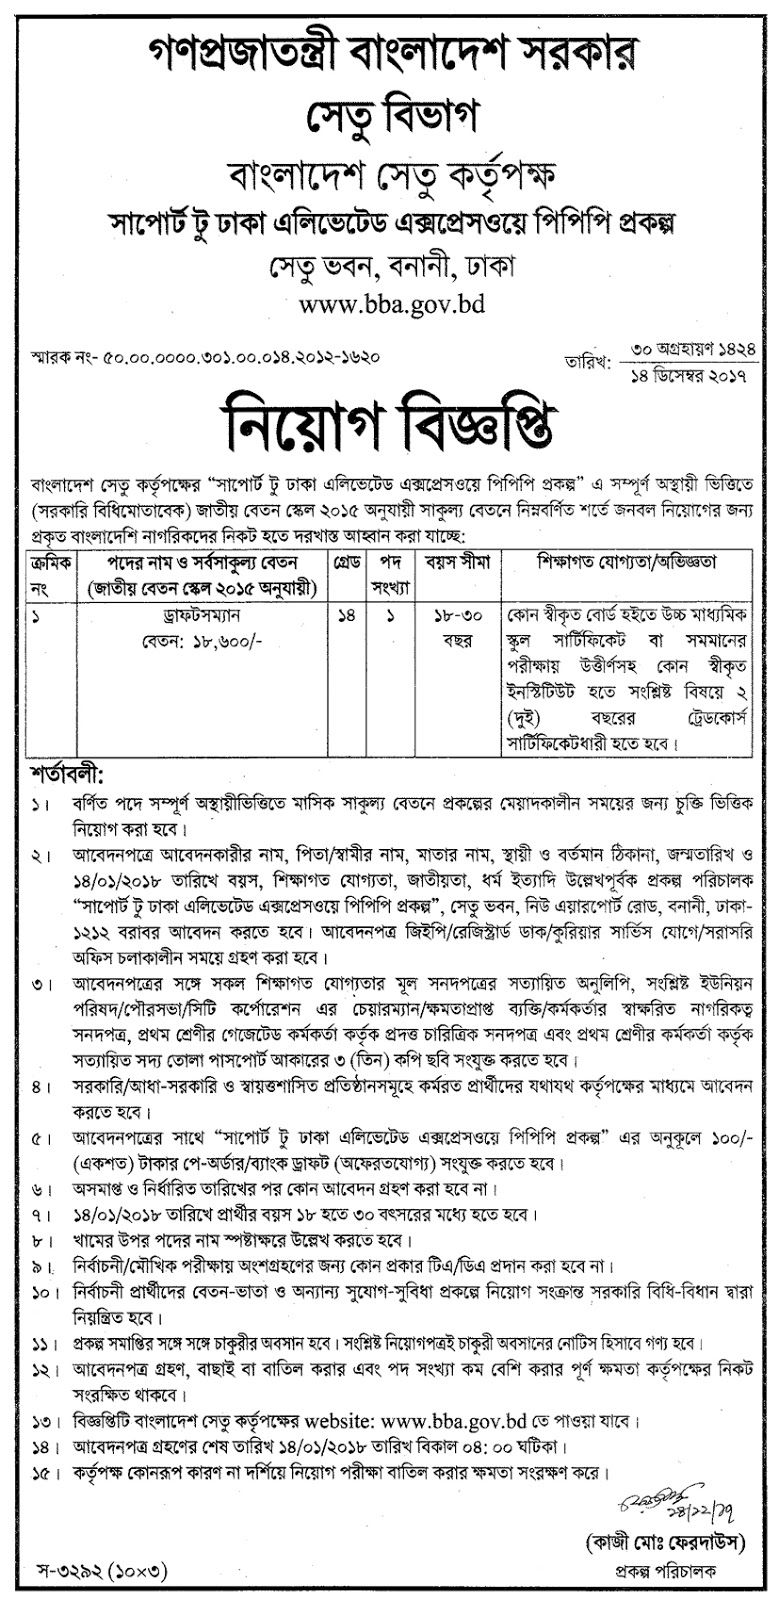 Department of Bangladesh Bridge Authority Job Circular 2018